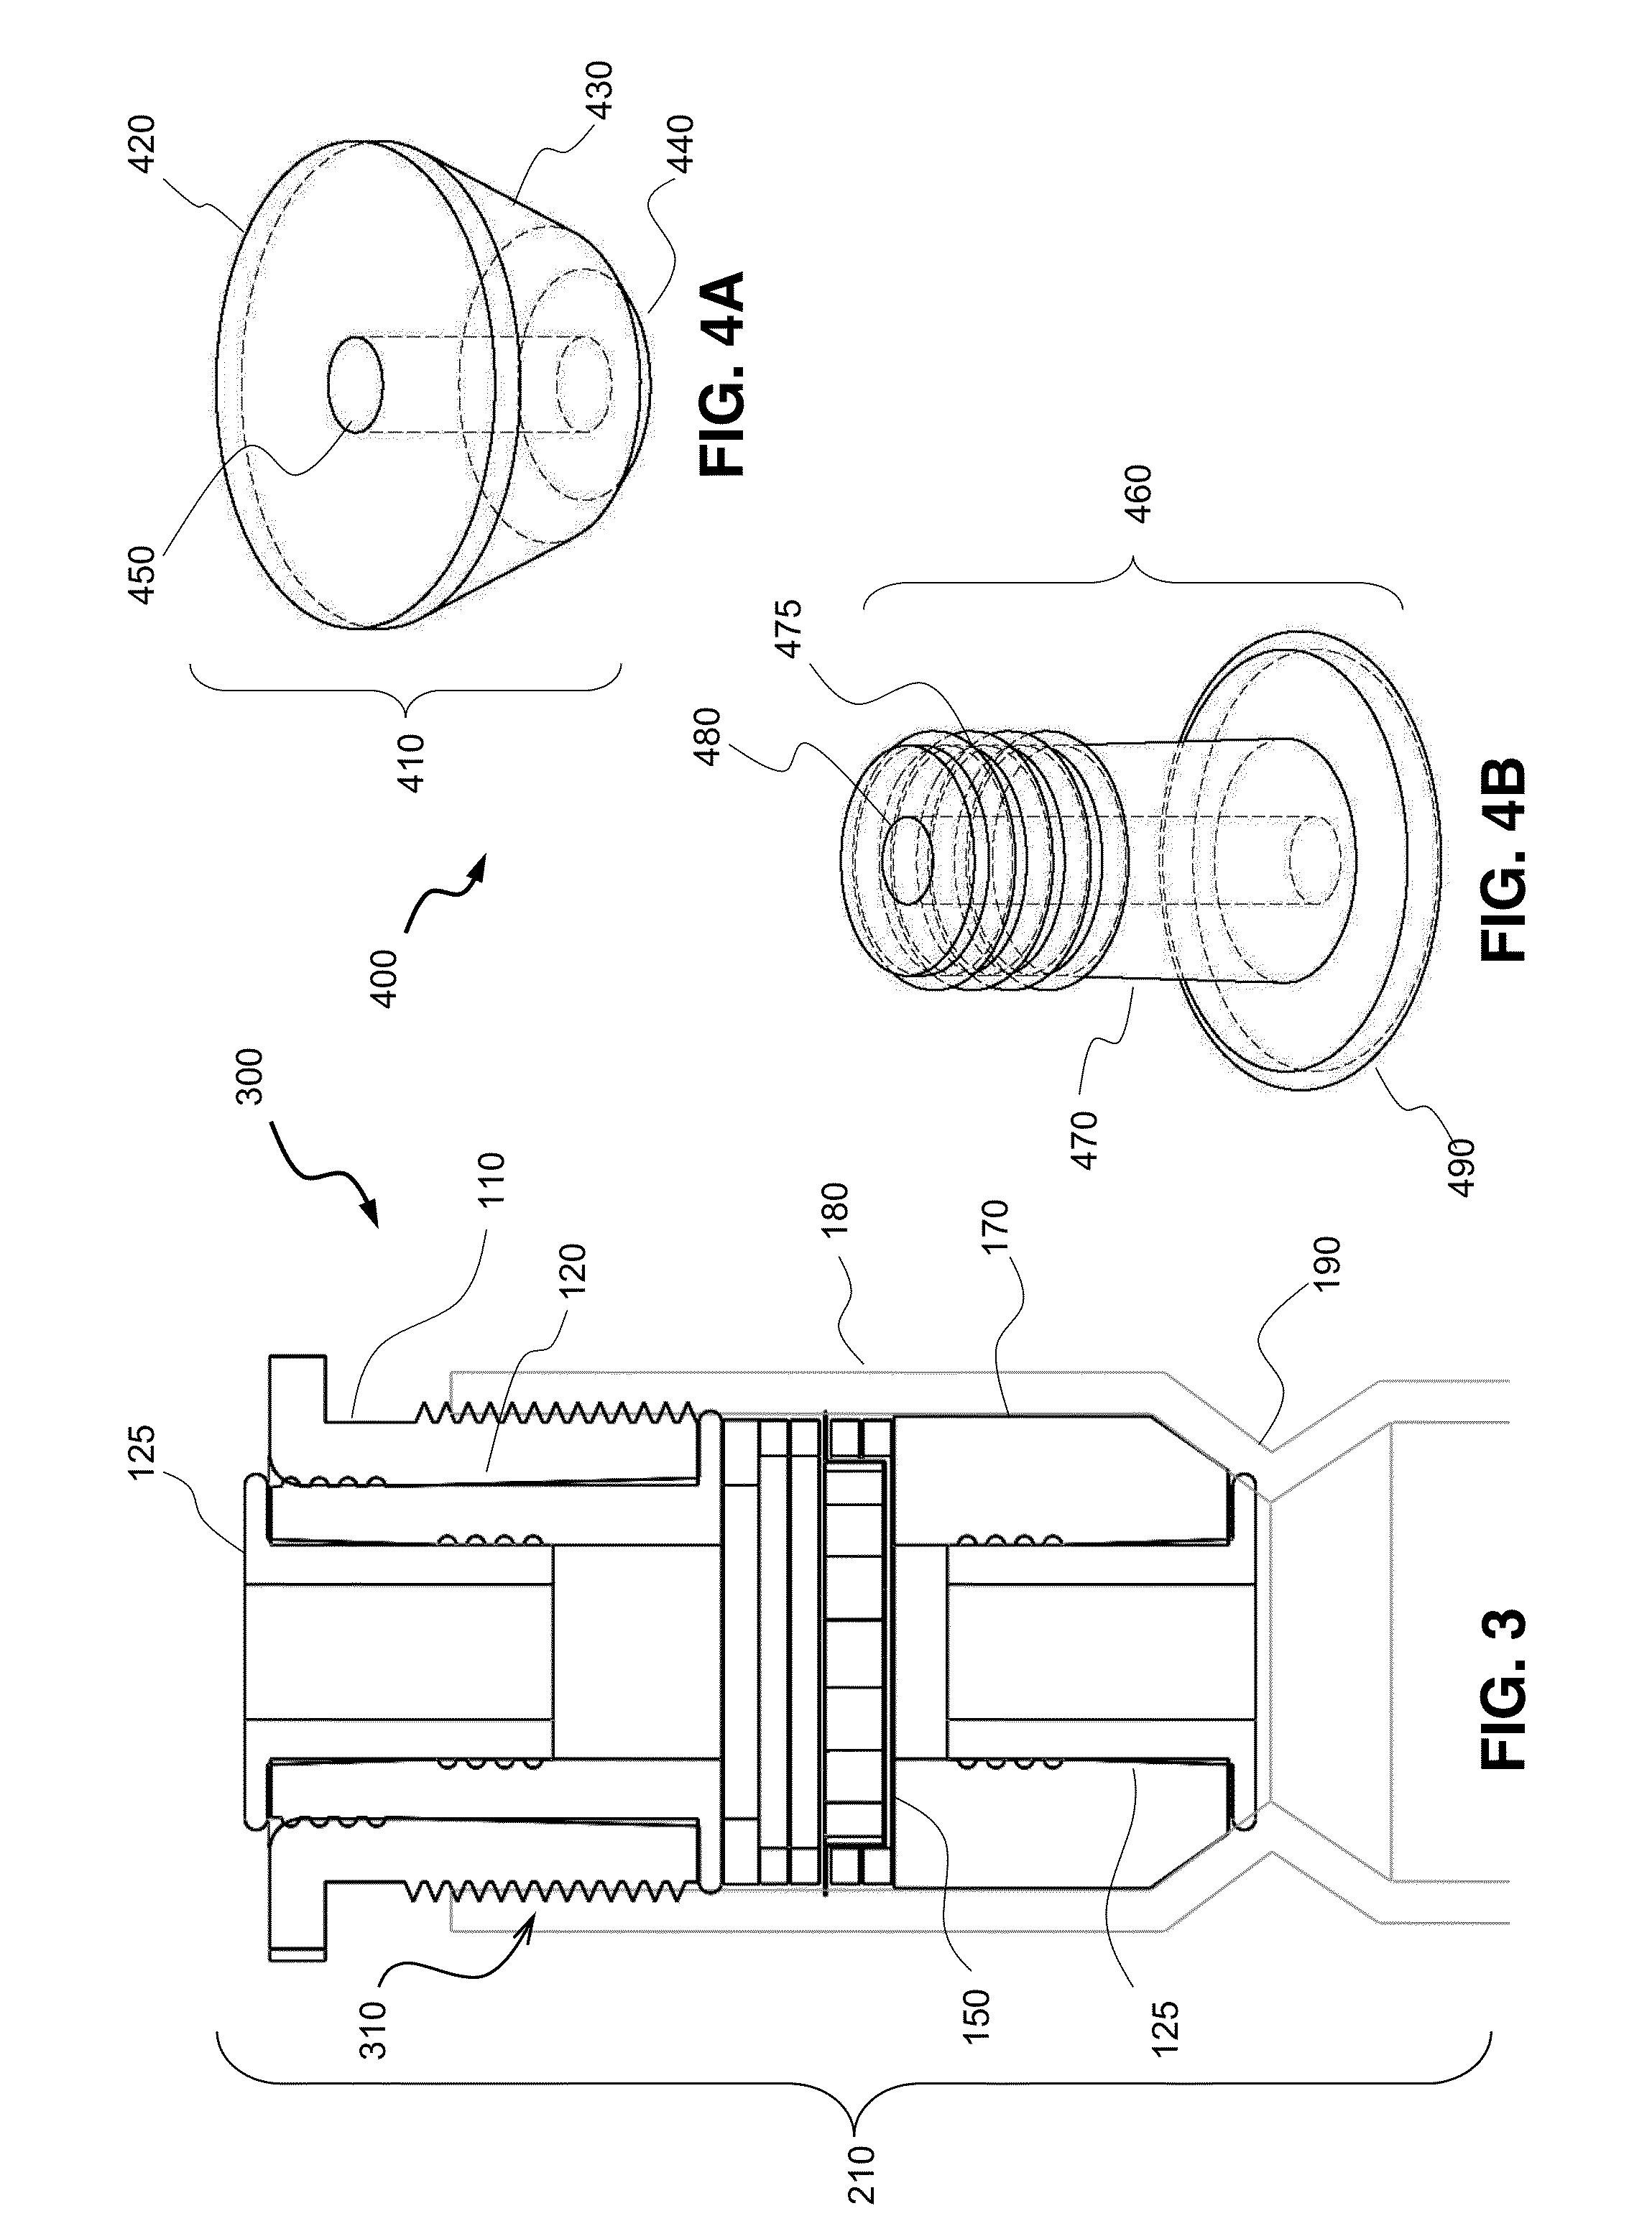 US20140041938A1 20140213 D00003 rain bird solenoid wiring diagram tractor repair with wiring diagram,Lawn Sprinkler System Pump Wiring